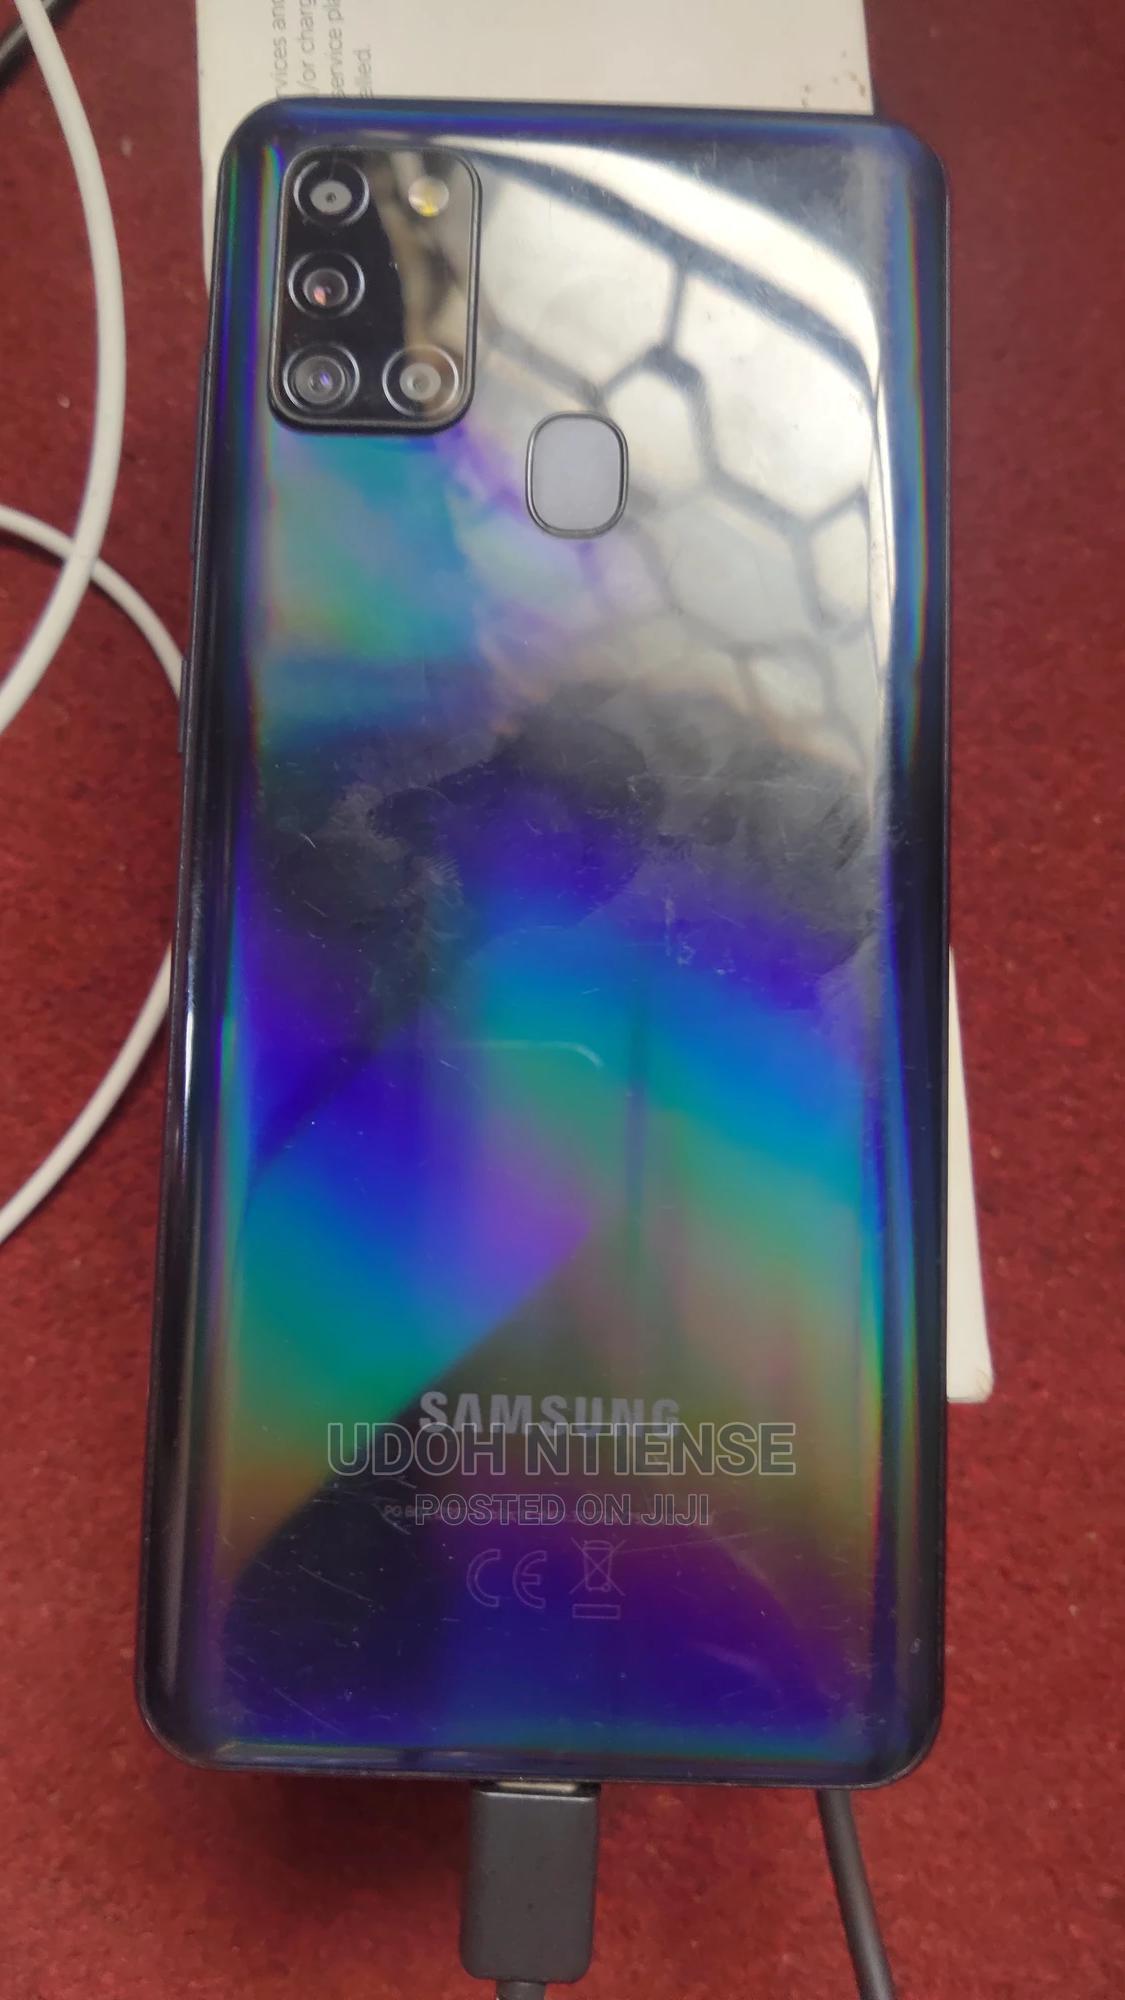 Samsung Galaxy A21s 64 GB Black | Mobile Phones for sale in Benin City, Edo State, Nigeria